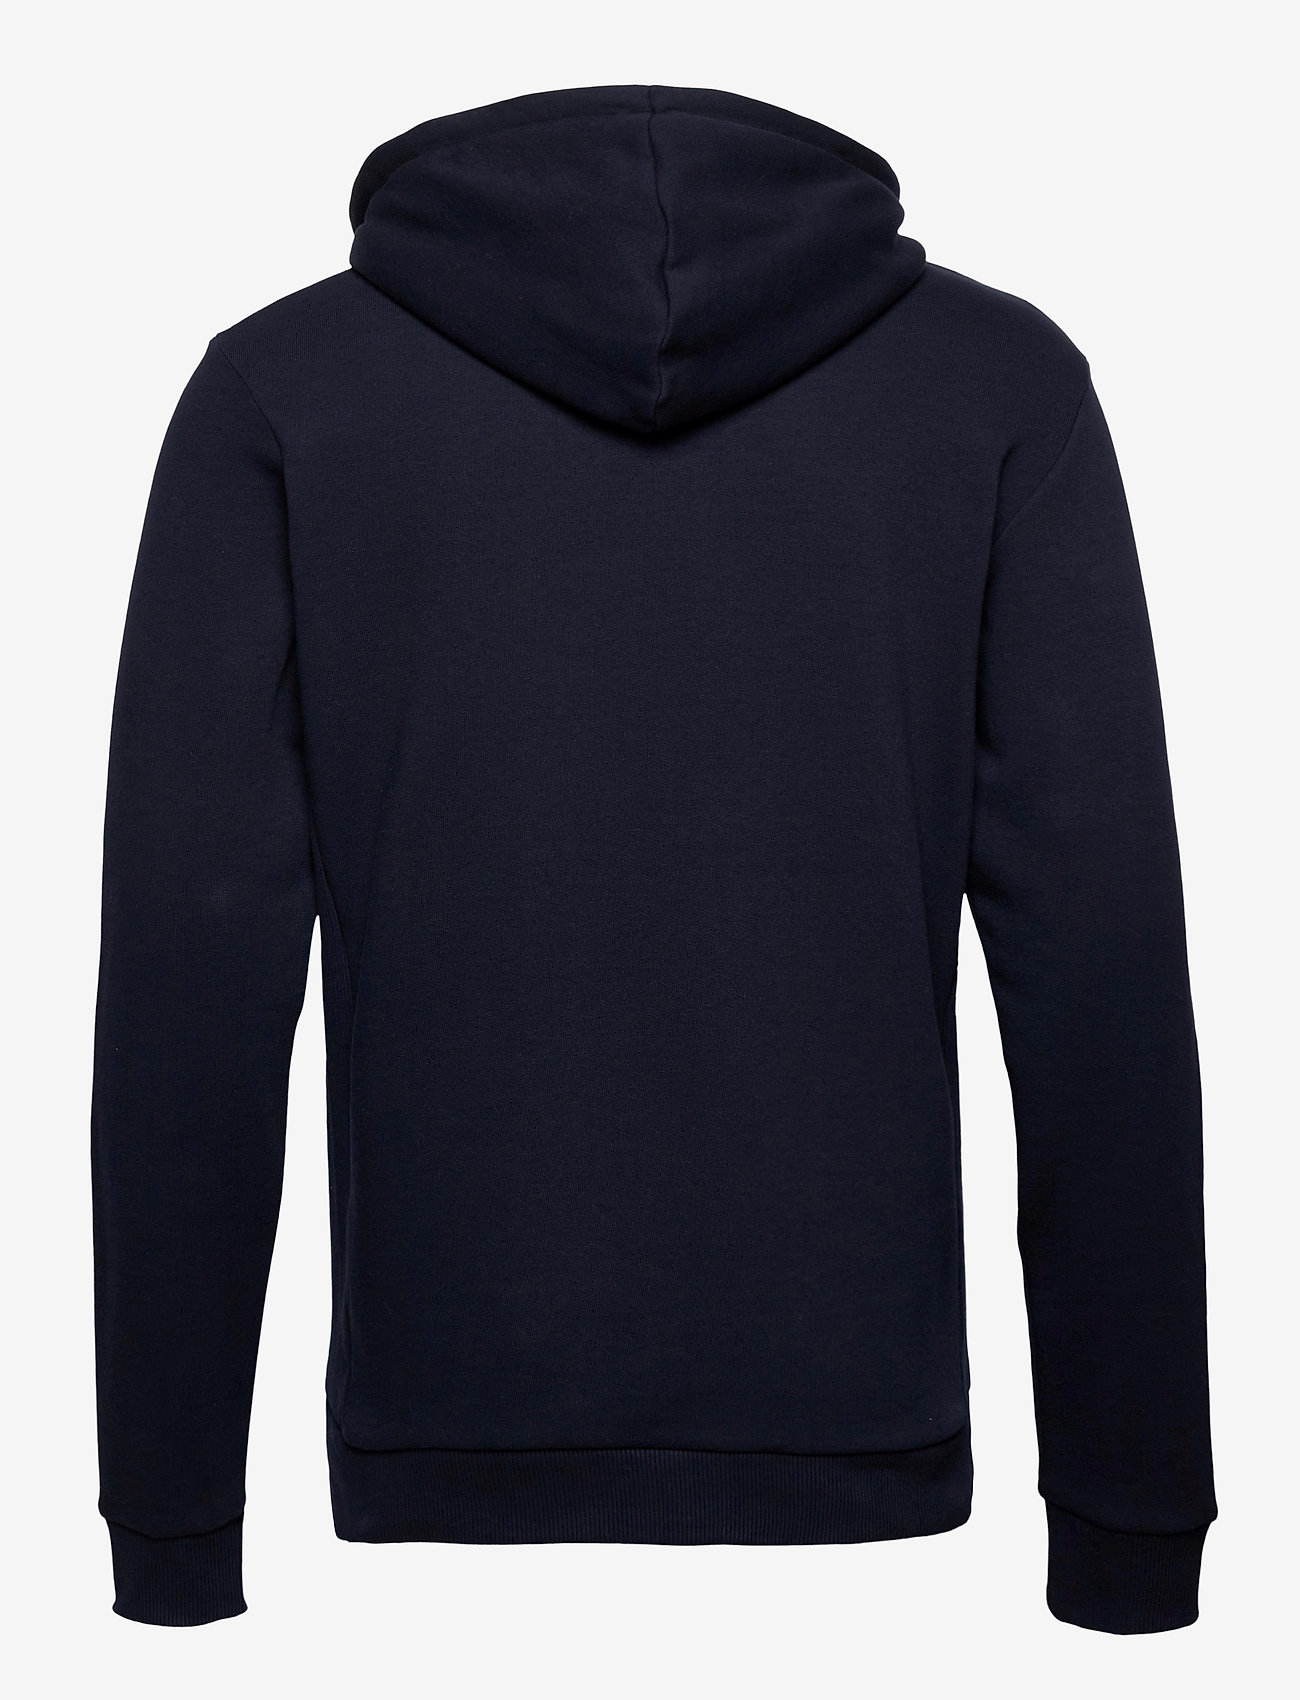 Les Deux - Clinton Zipper Hoodie - basic sweatshirts - dark navy/black - 1